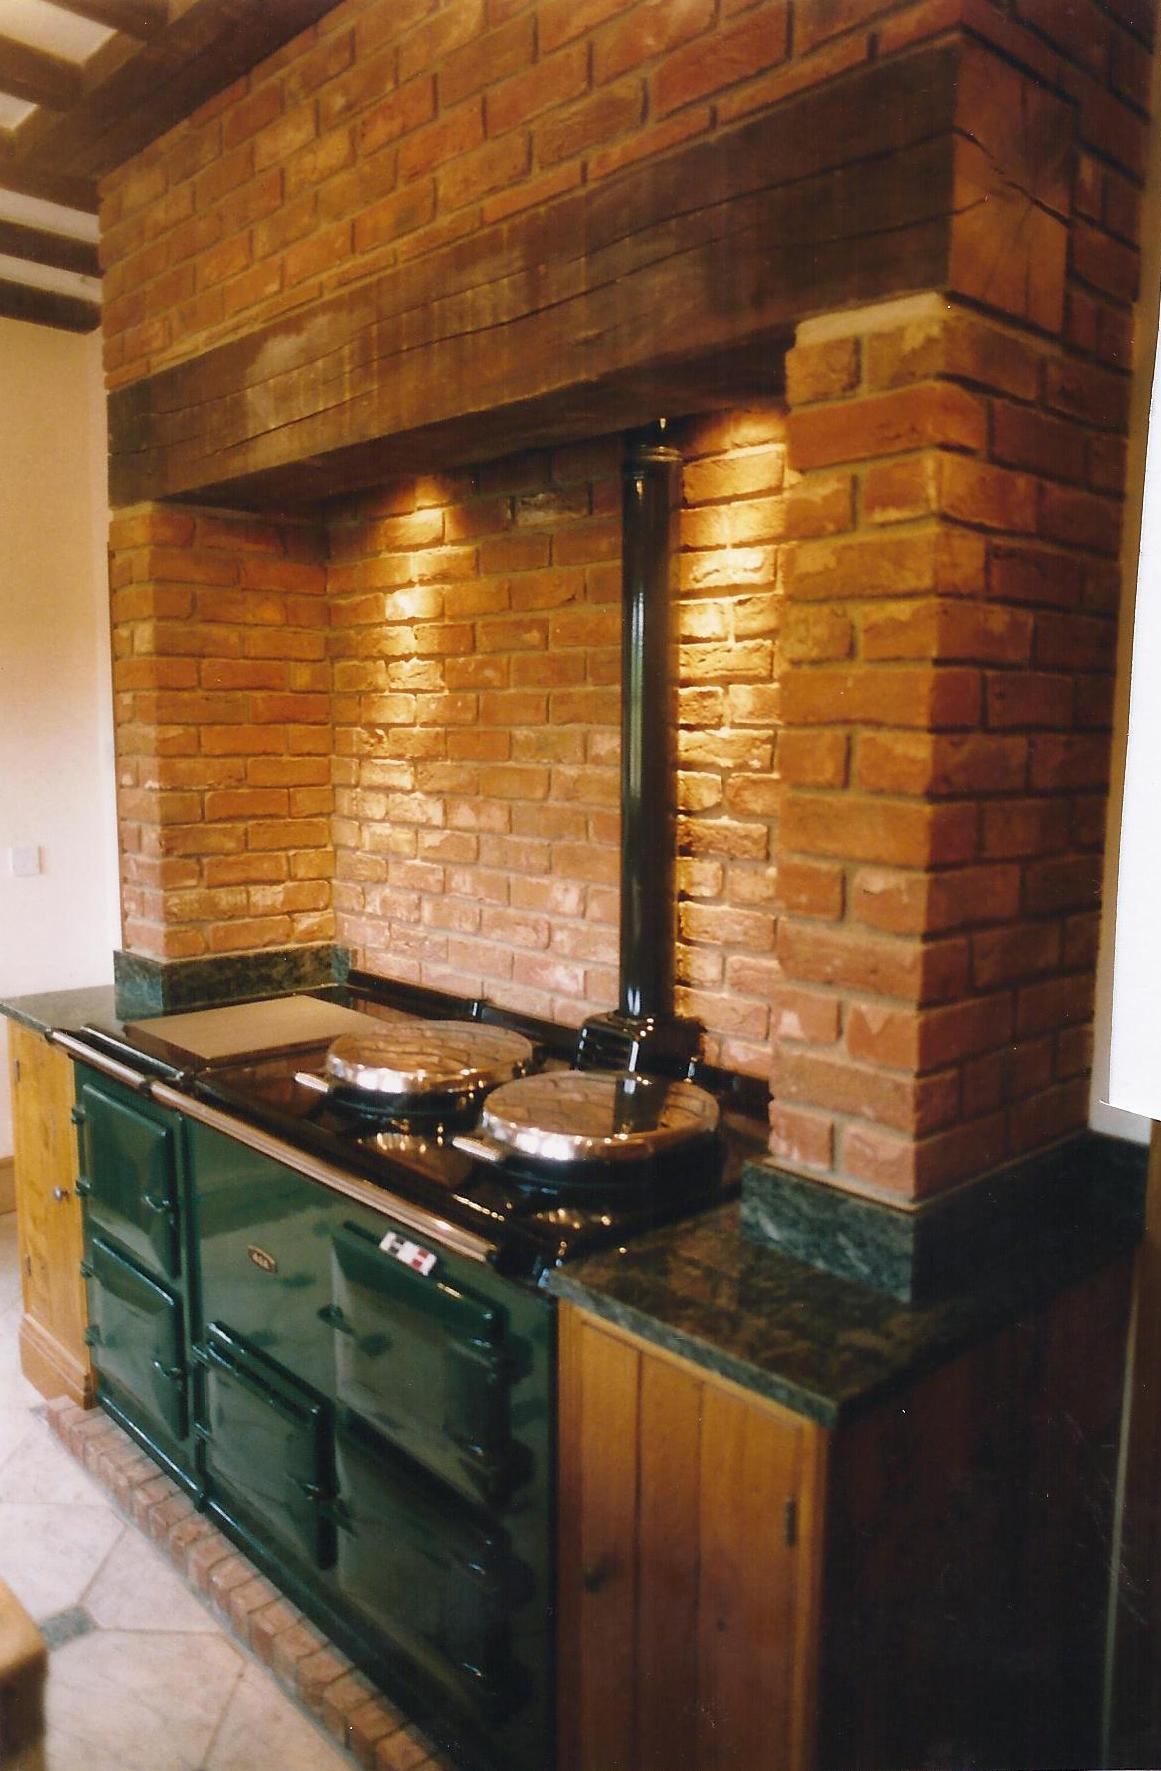 Kitchen Image 1 - North End Farm - East Yorkshire Architects - Samuel Kendall Associates